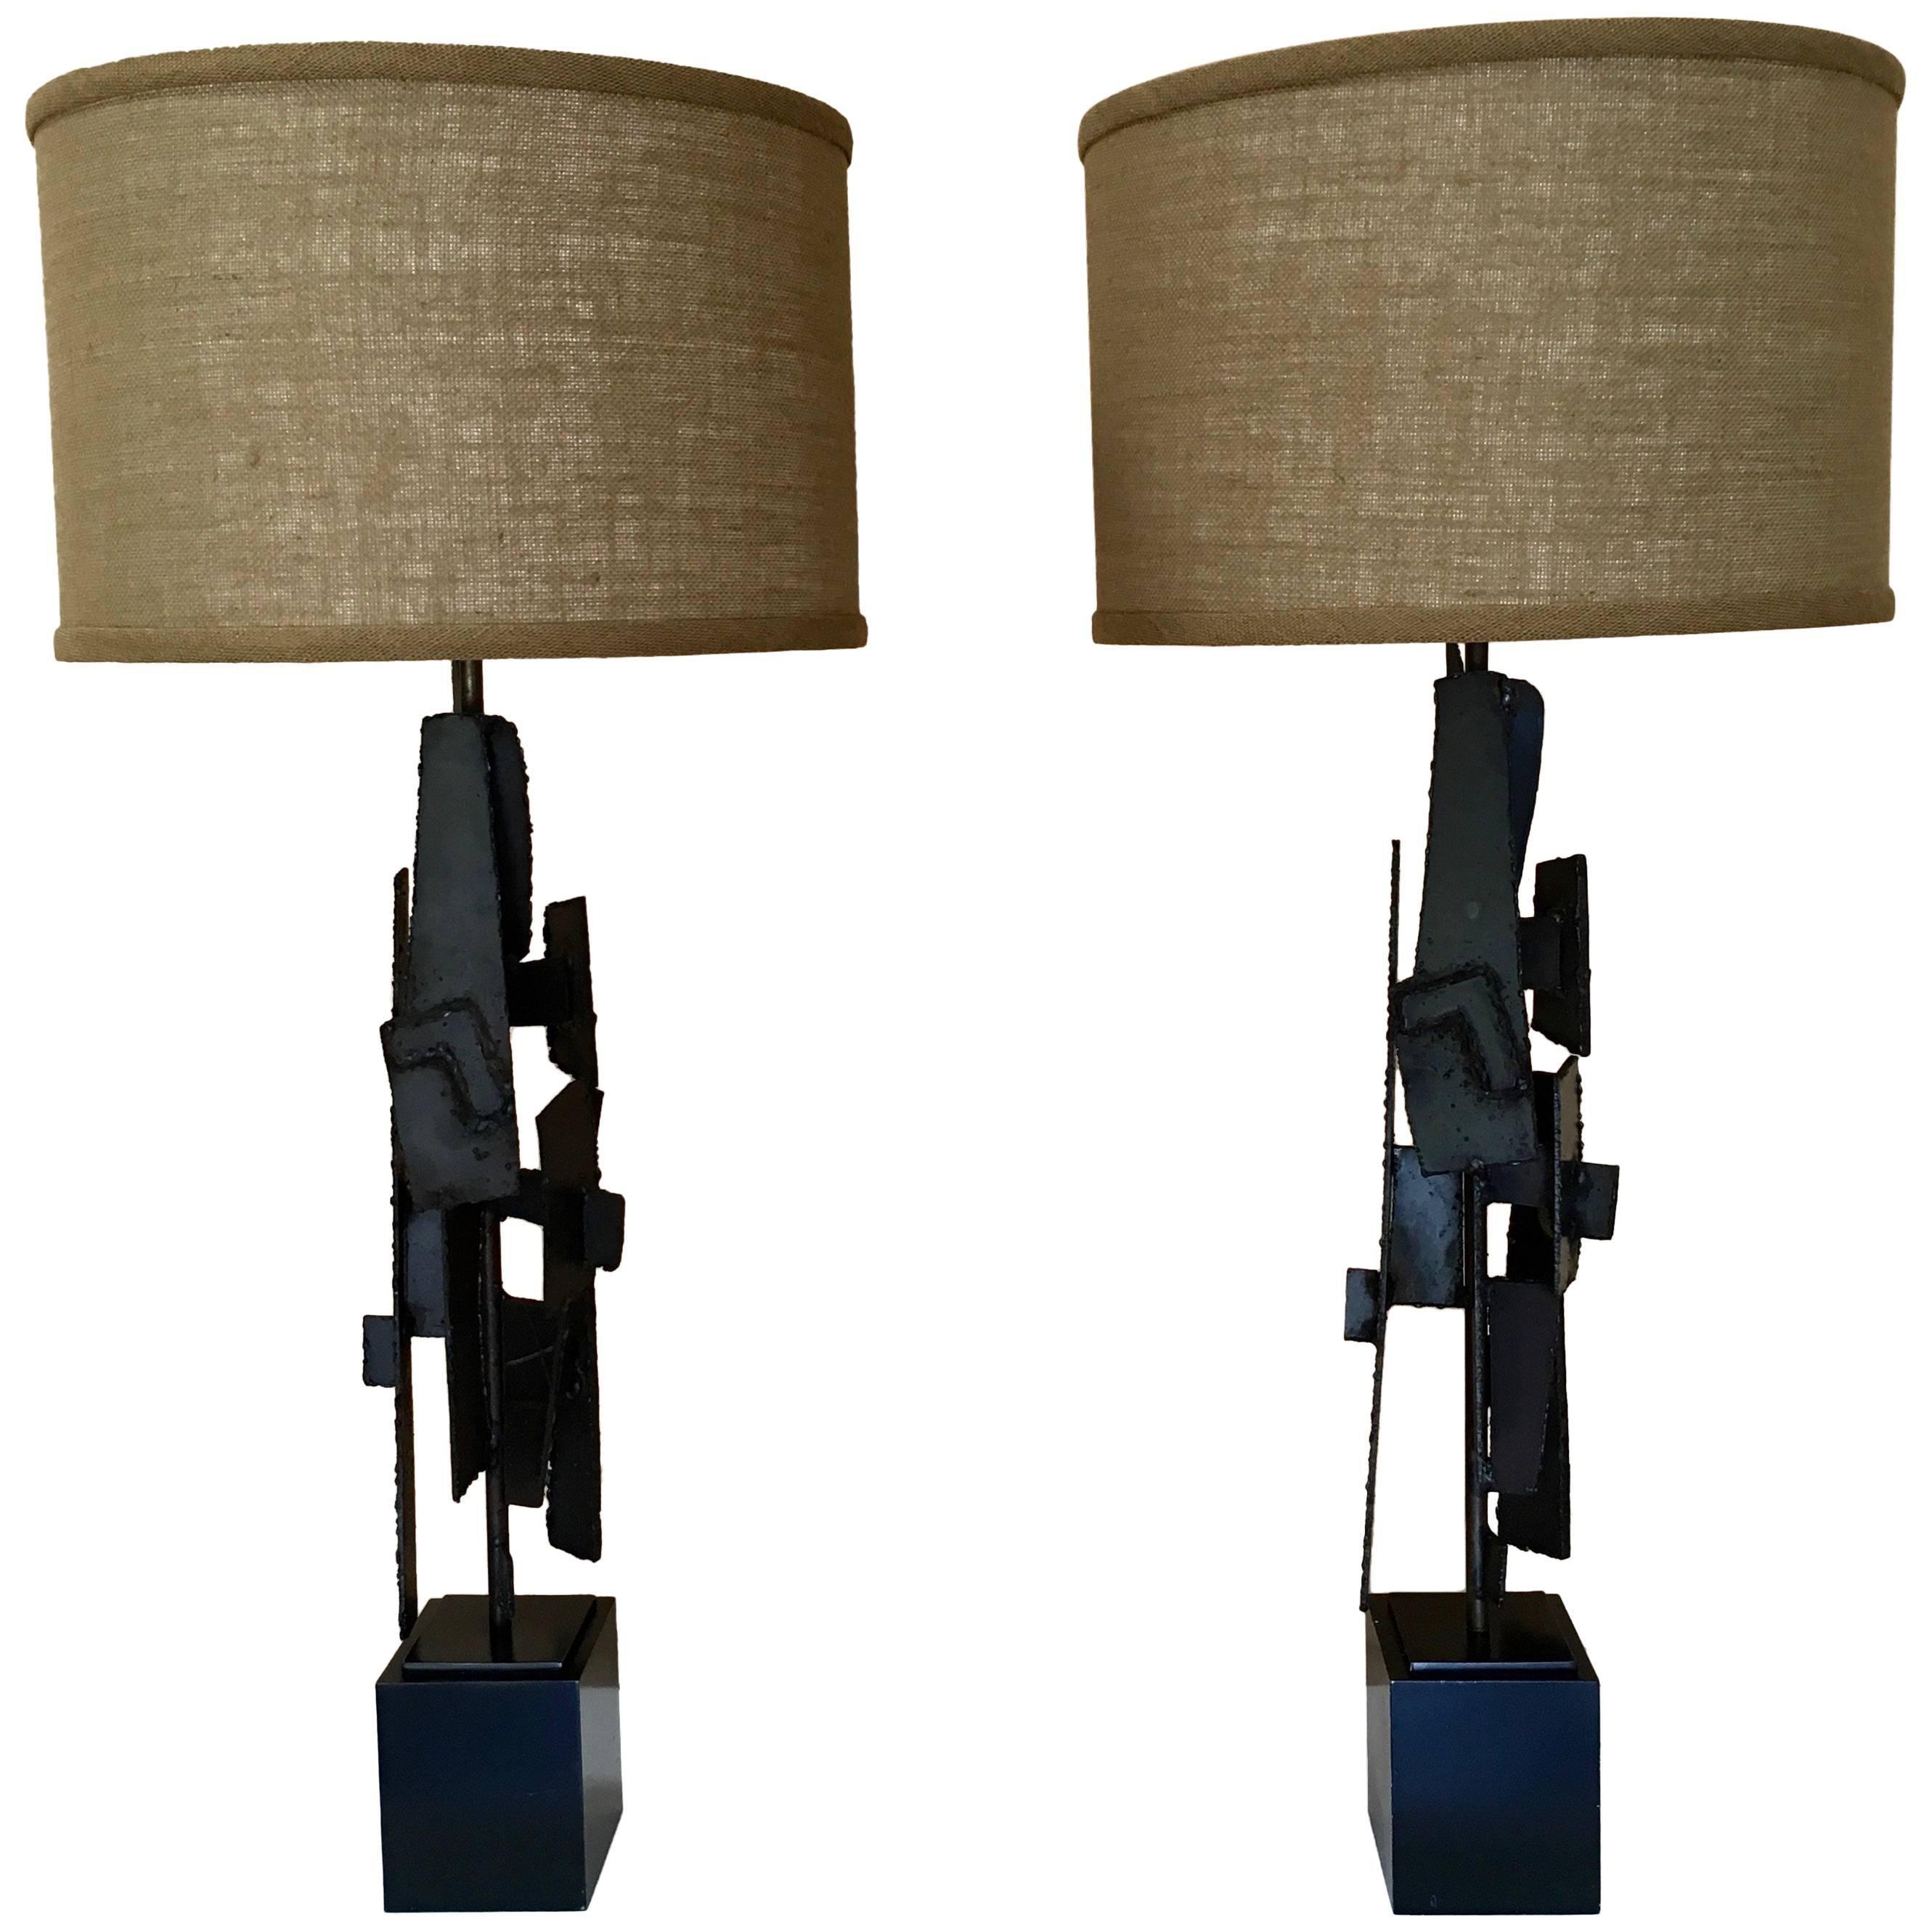 Pair of Sculptural Torch Cut Lamps by Richard Barr